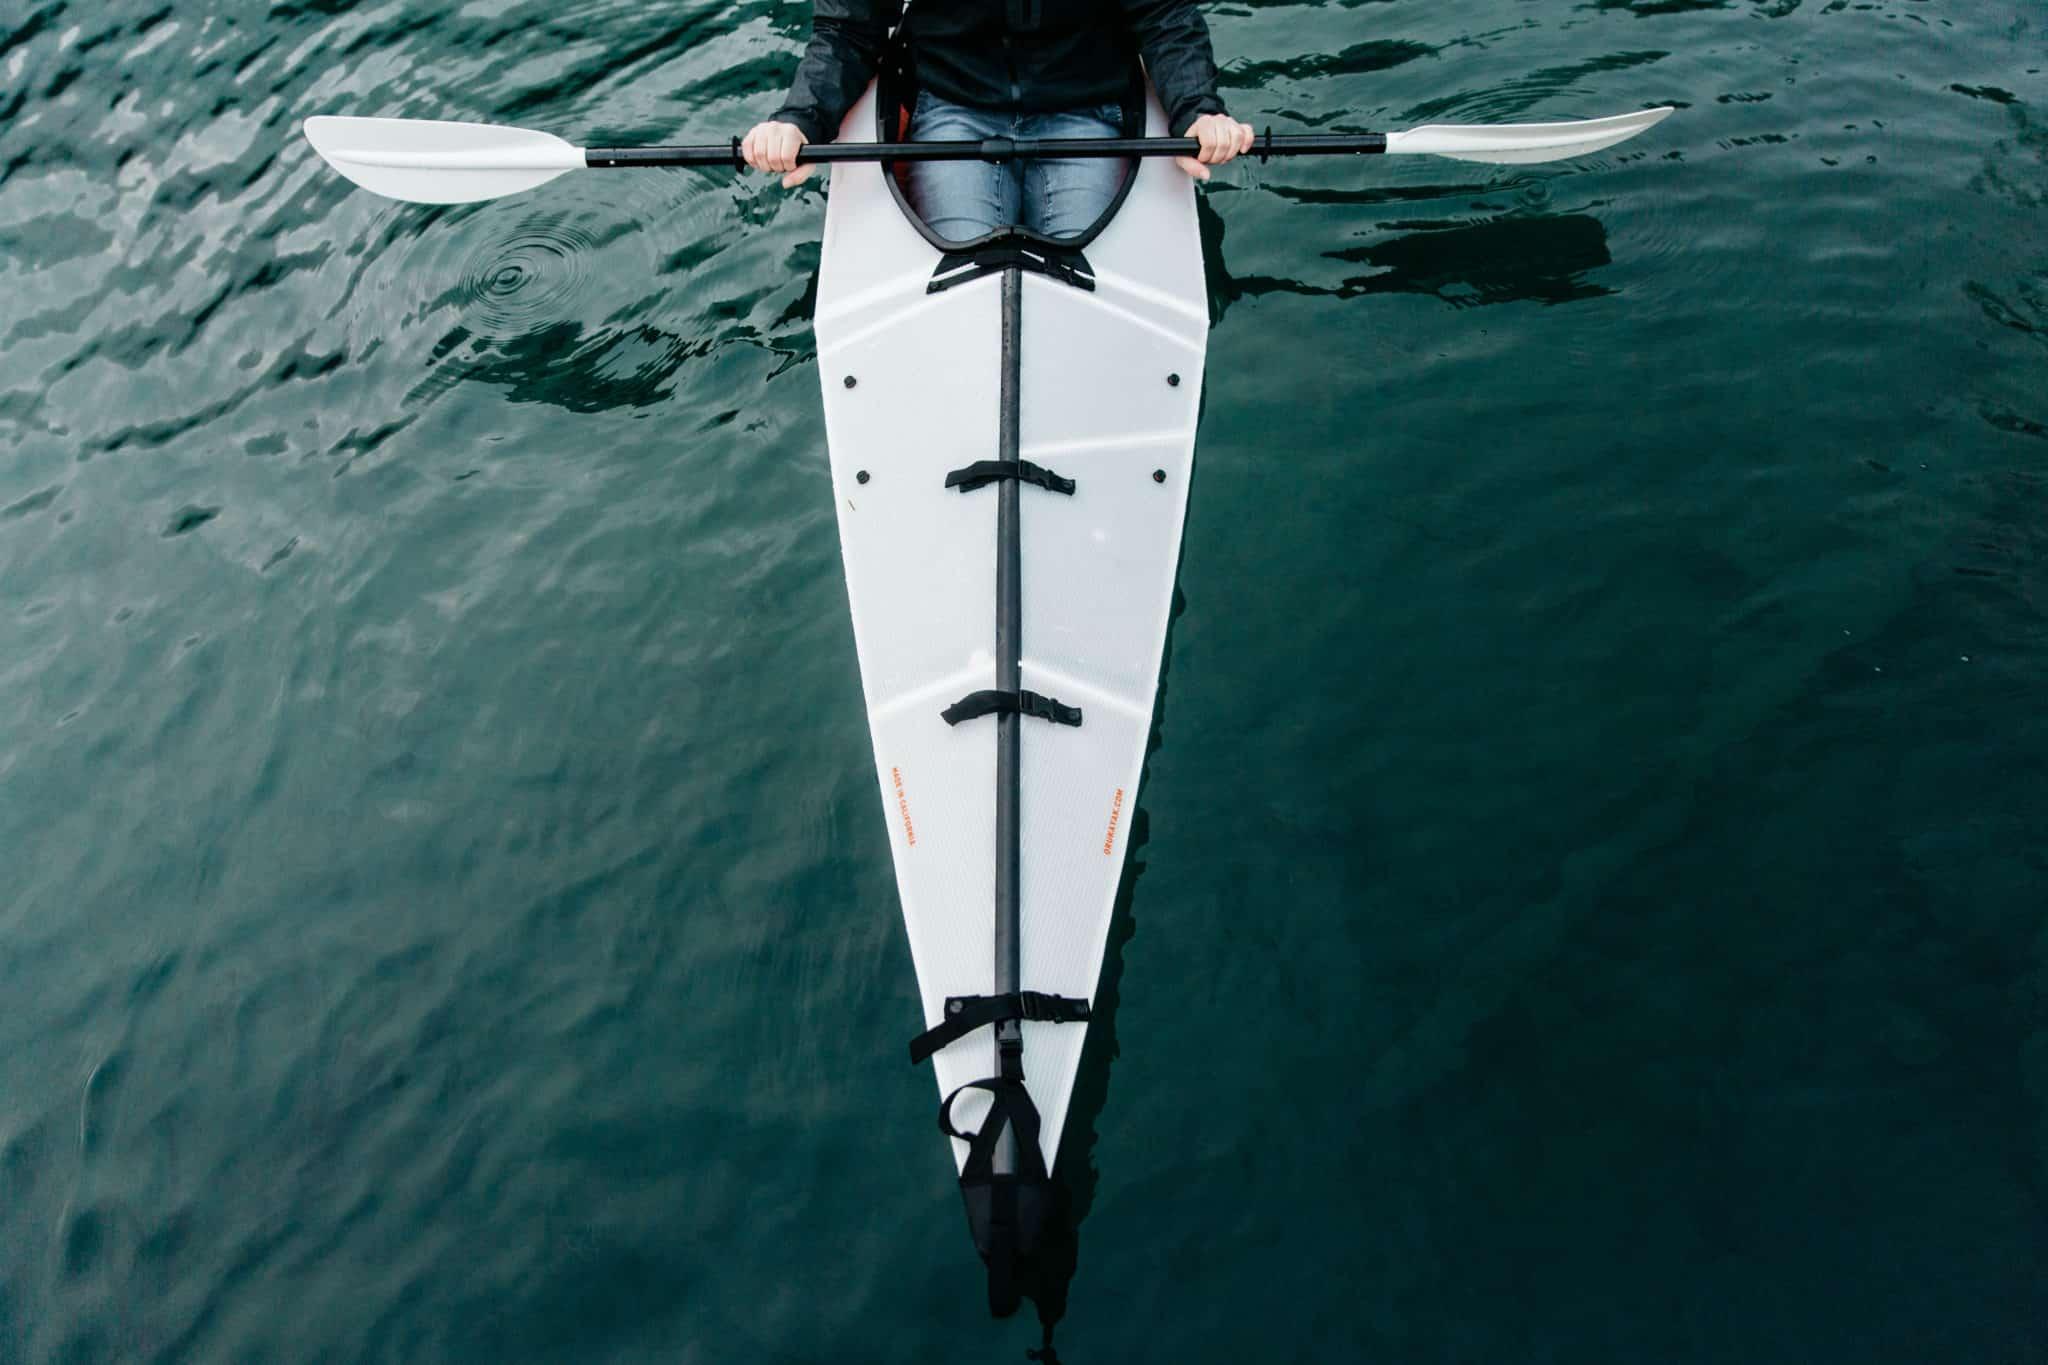 Olympic Peninsula Road Trip - Oru Kayak on Lake Crescent